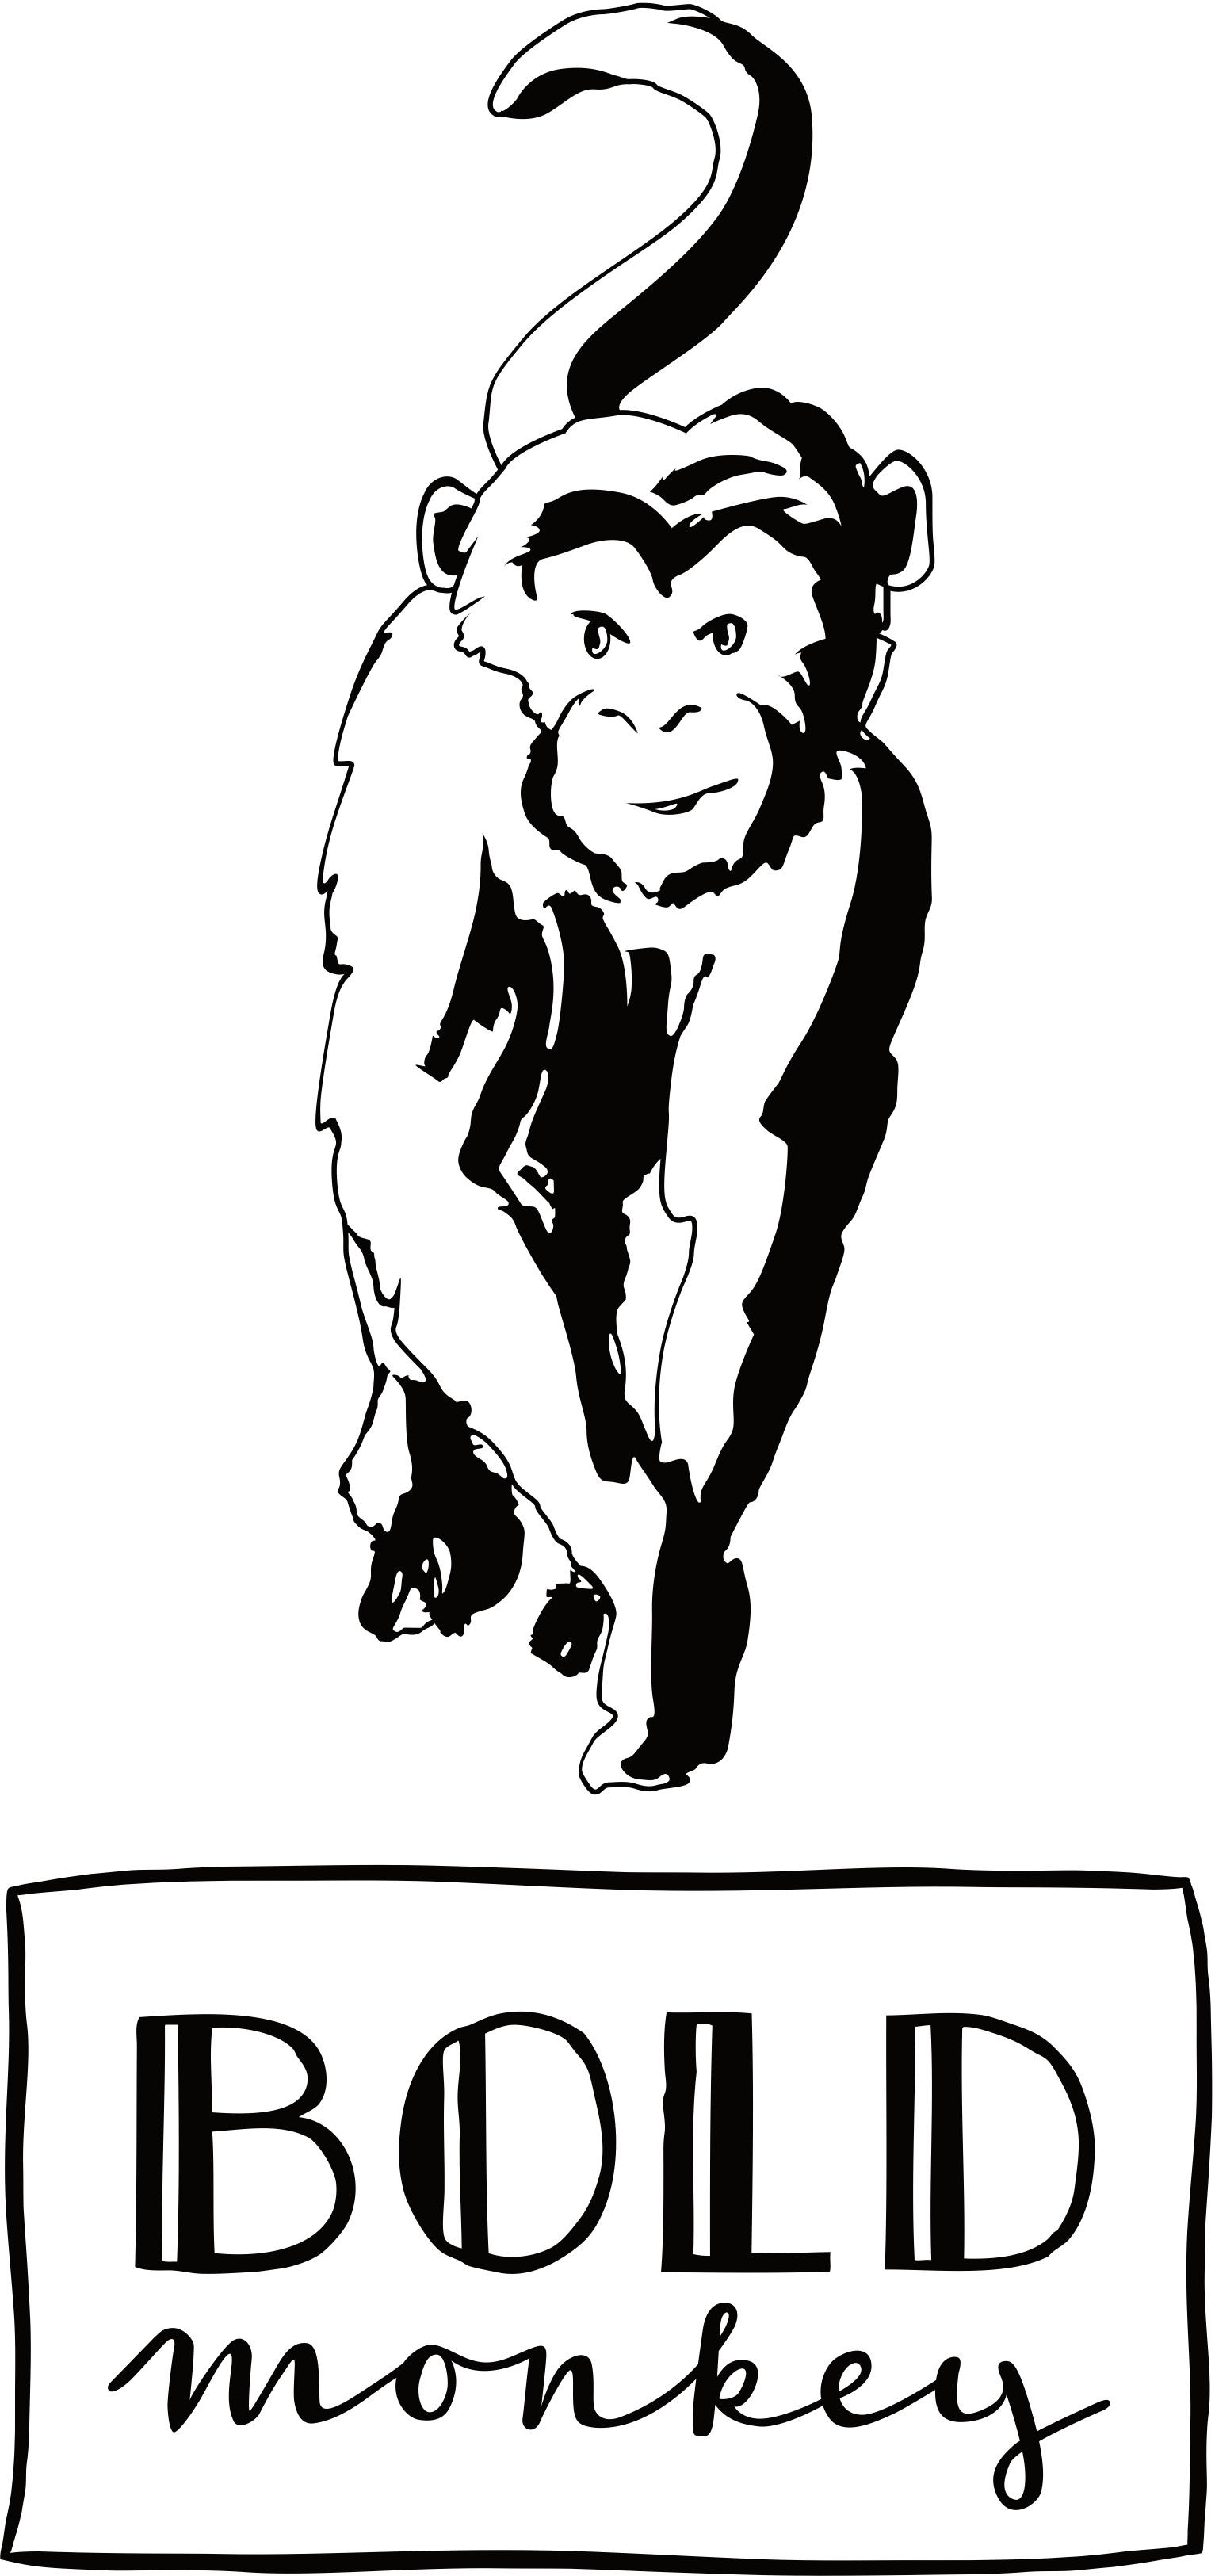 bold monkey Devilish Bulldog deco light roze